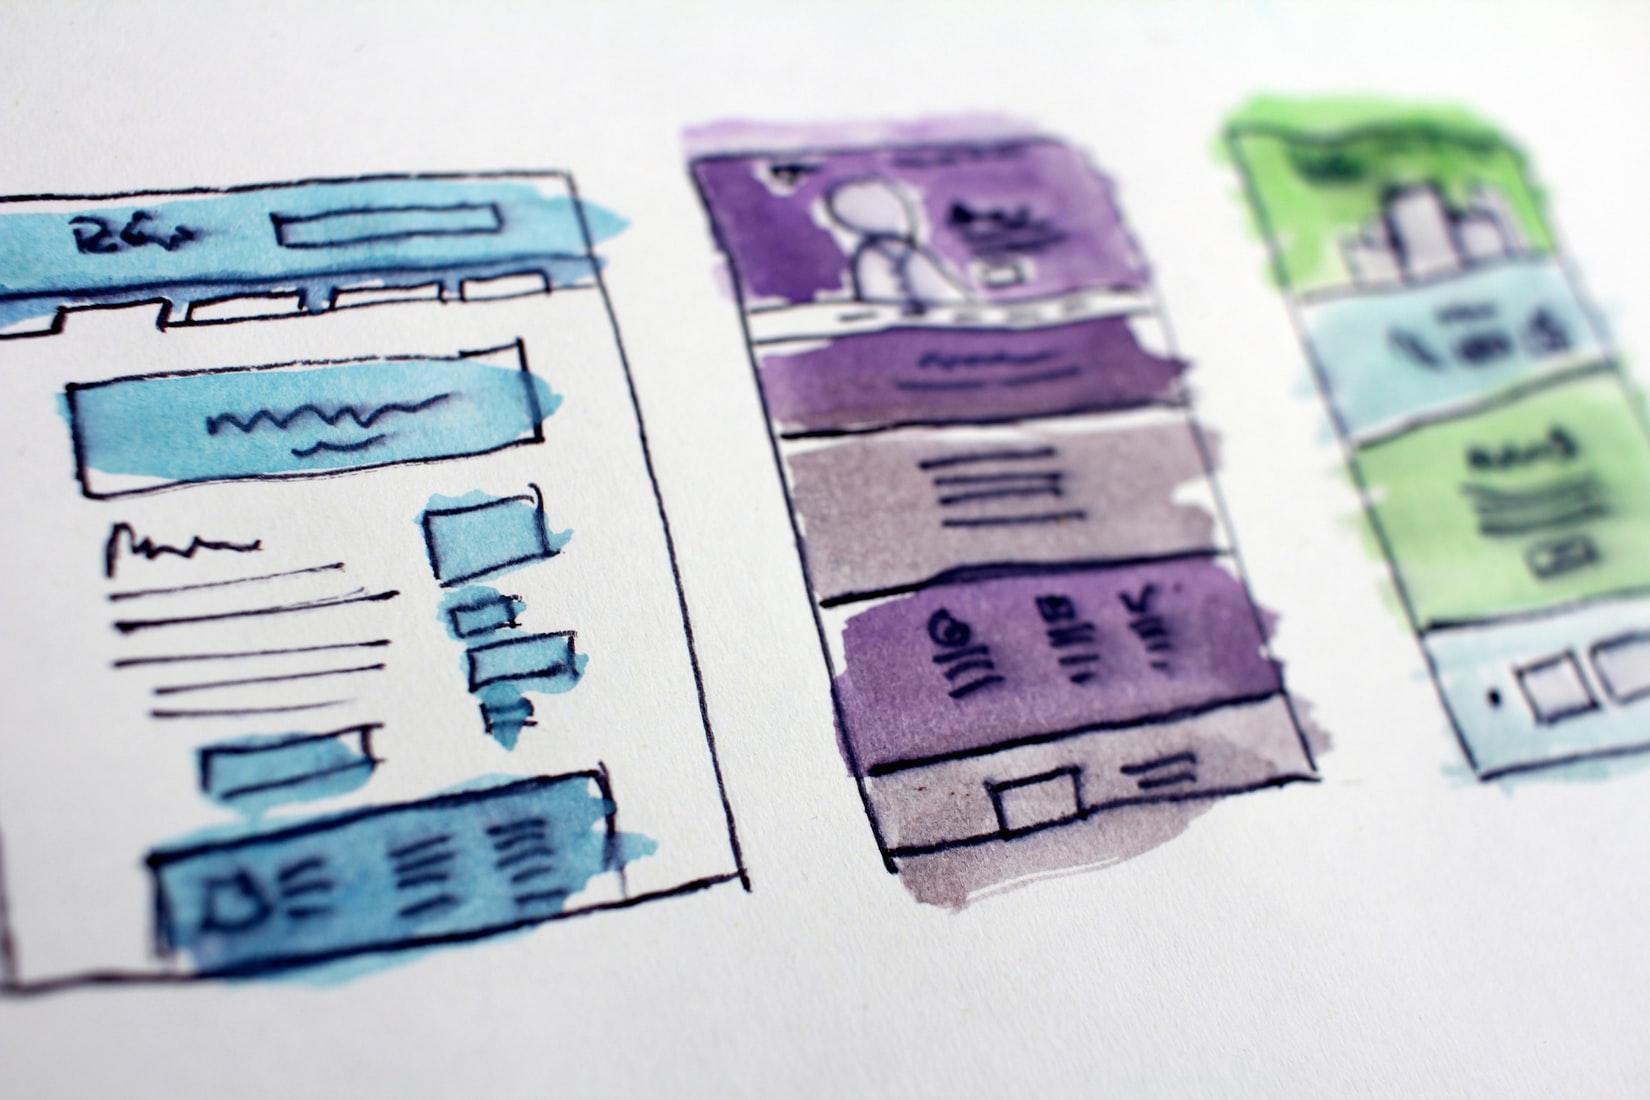 Poptop Update: New Catalogue Design